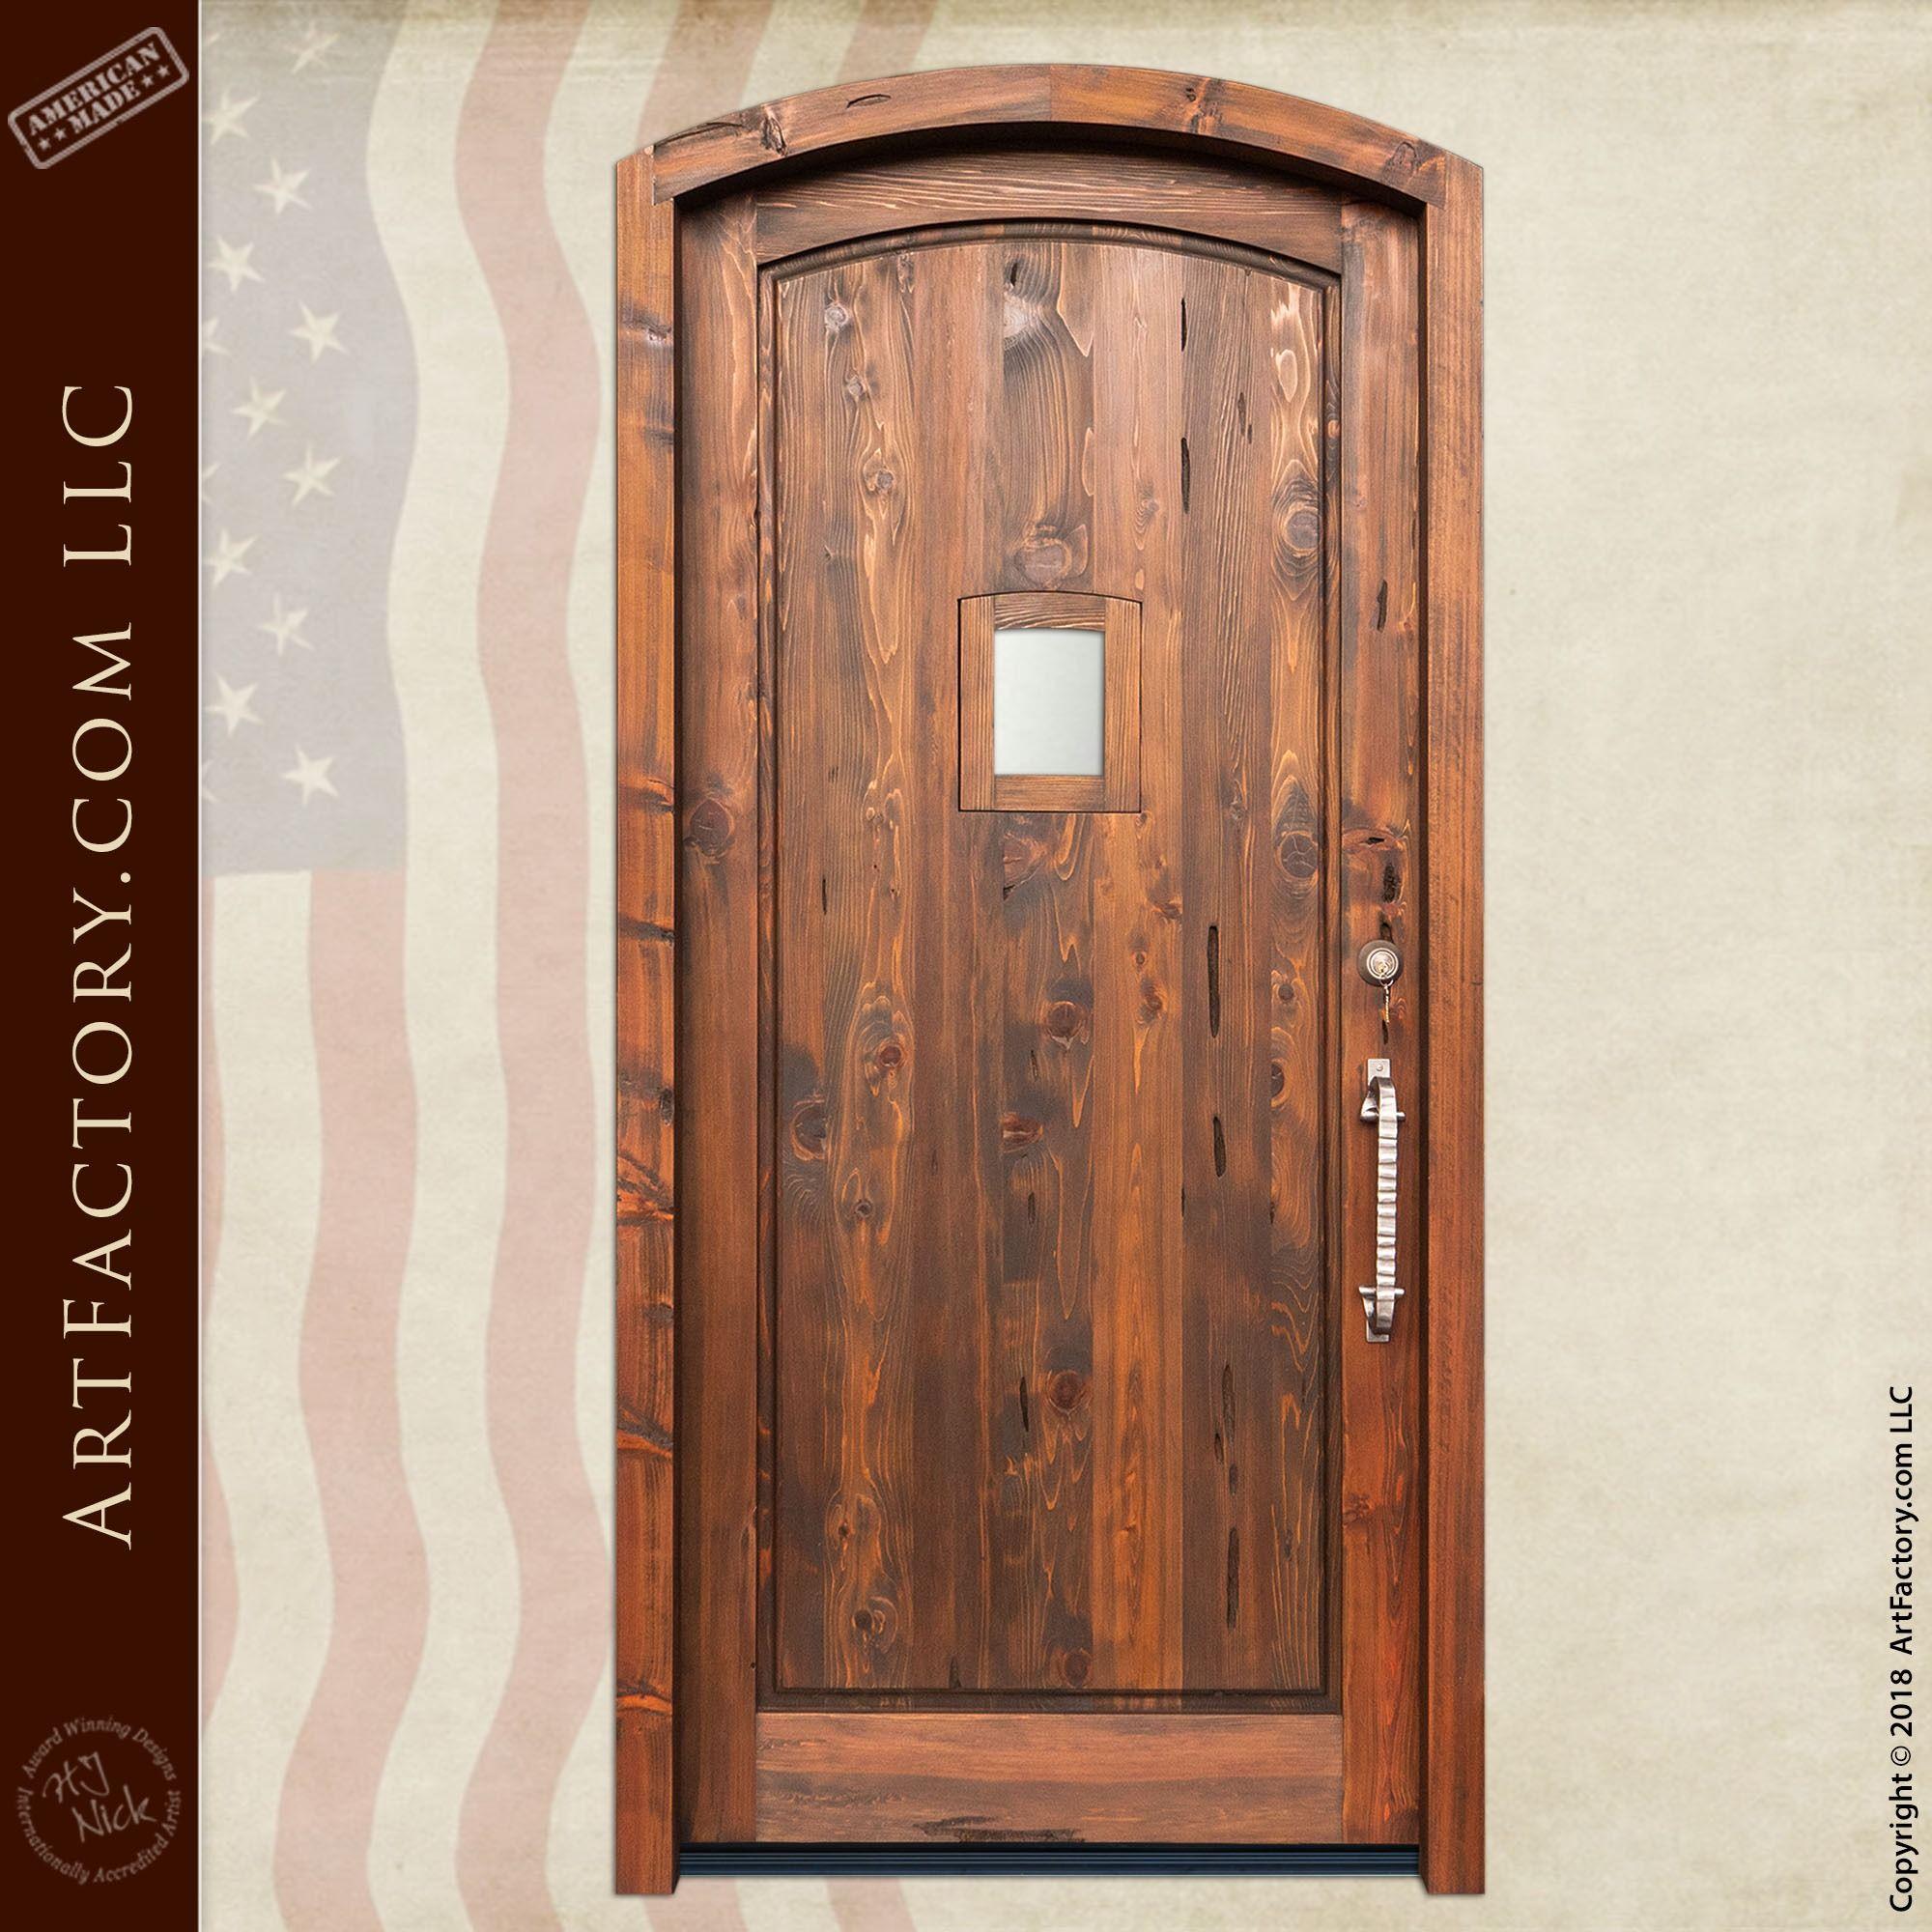 Rustic Wooden Portal Door With Custom Semi Arched Design Wooden